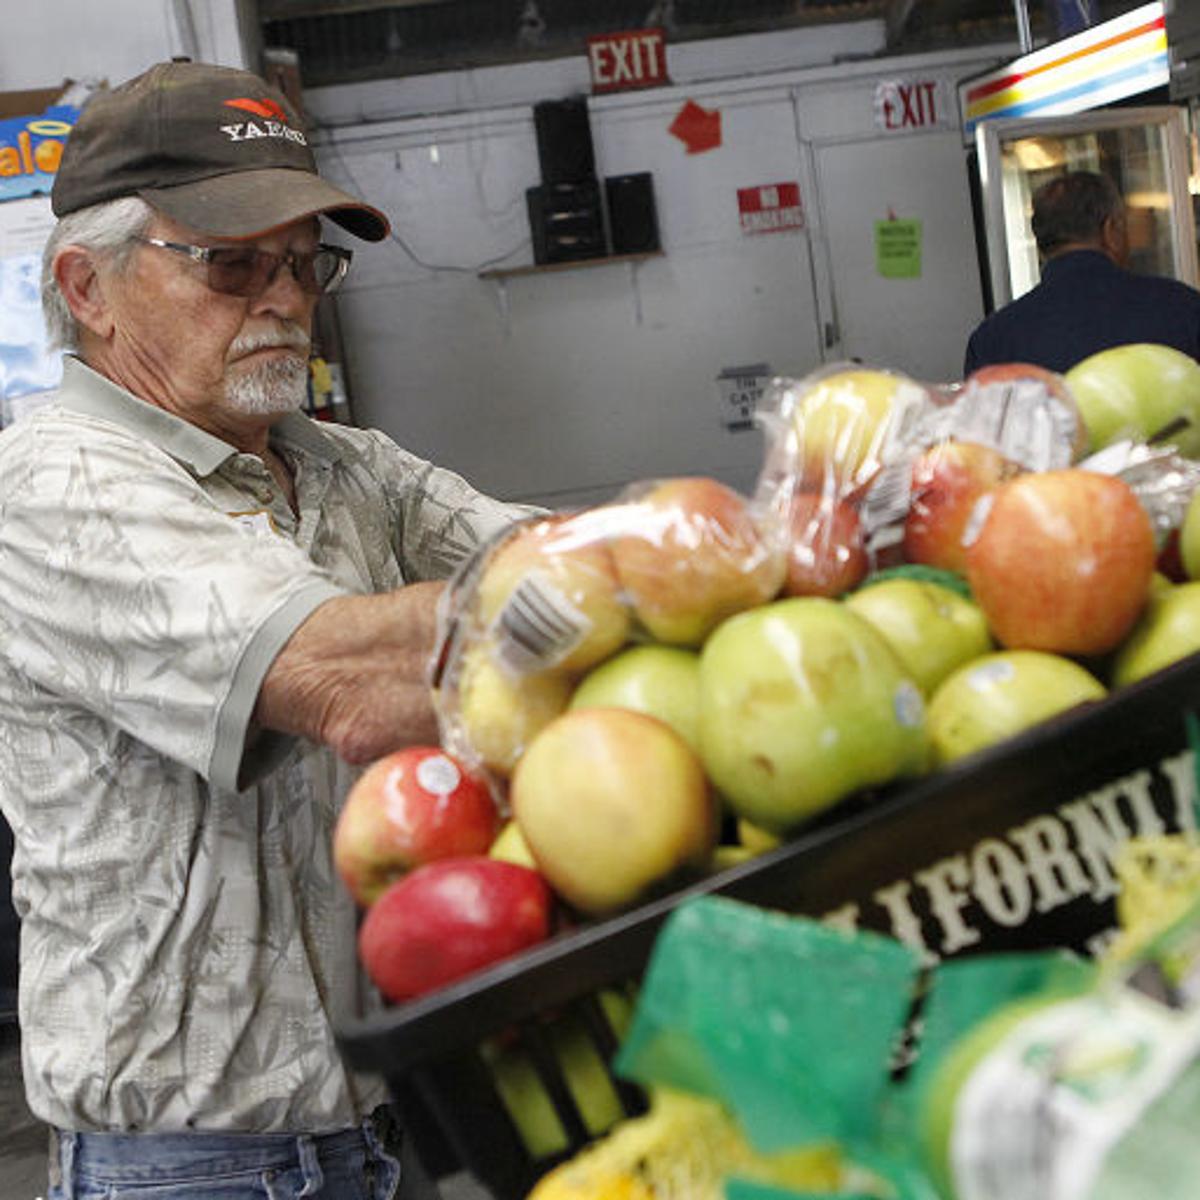 Slo County Food Bank Looking To Move Close Oceano And Paso Robles Facilities Local News Santamariatimes Com